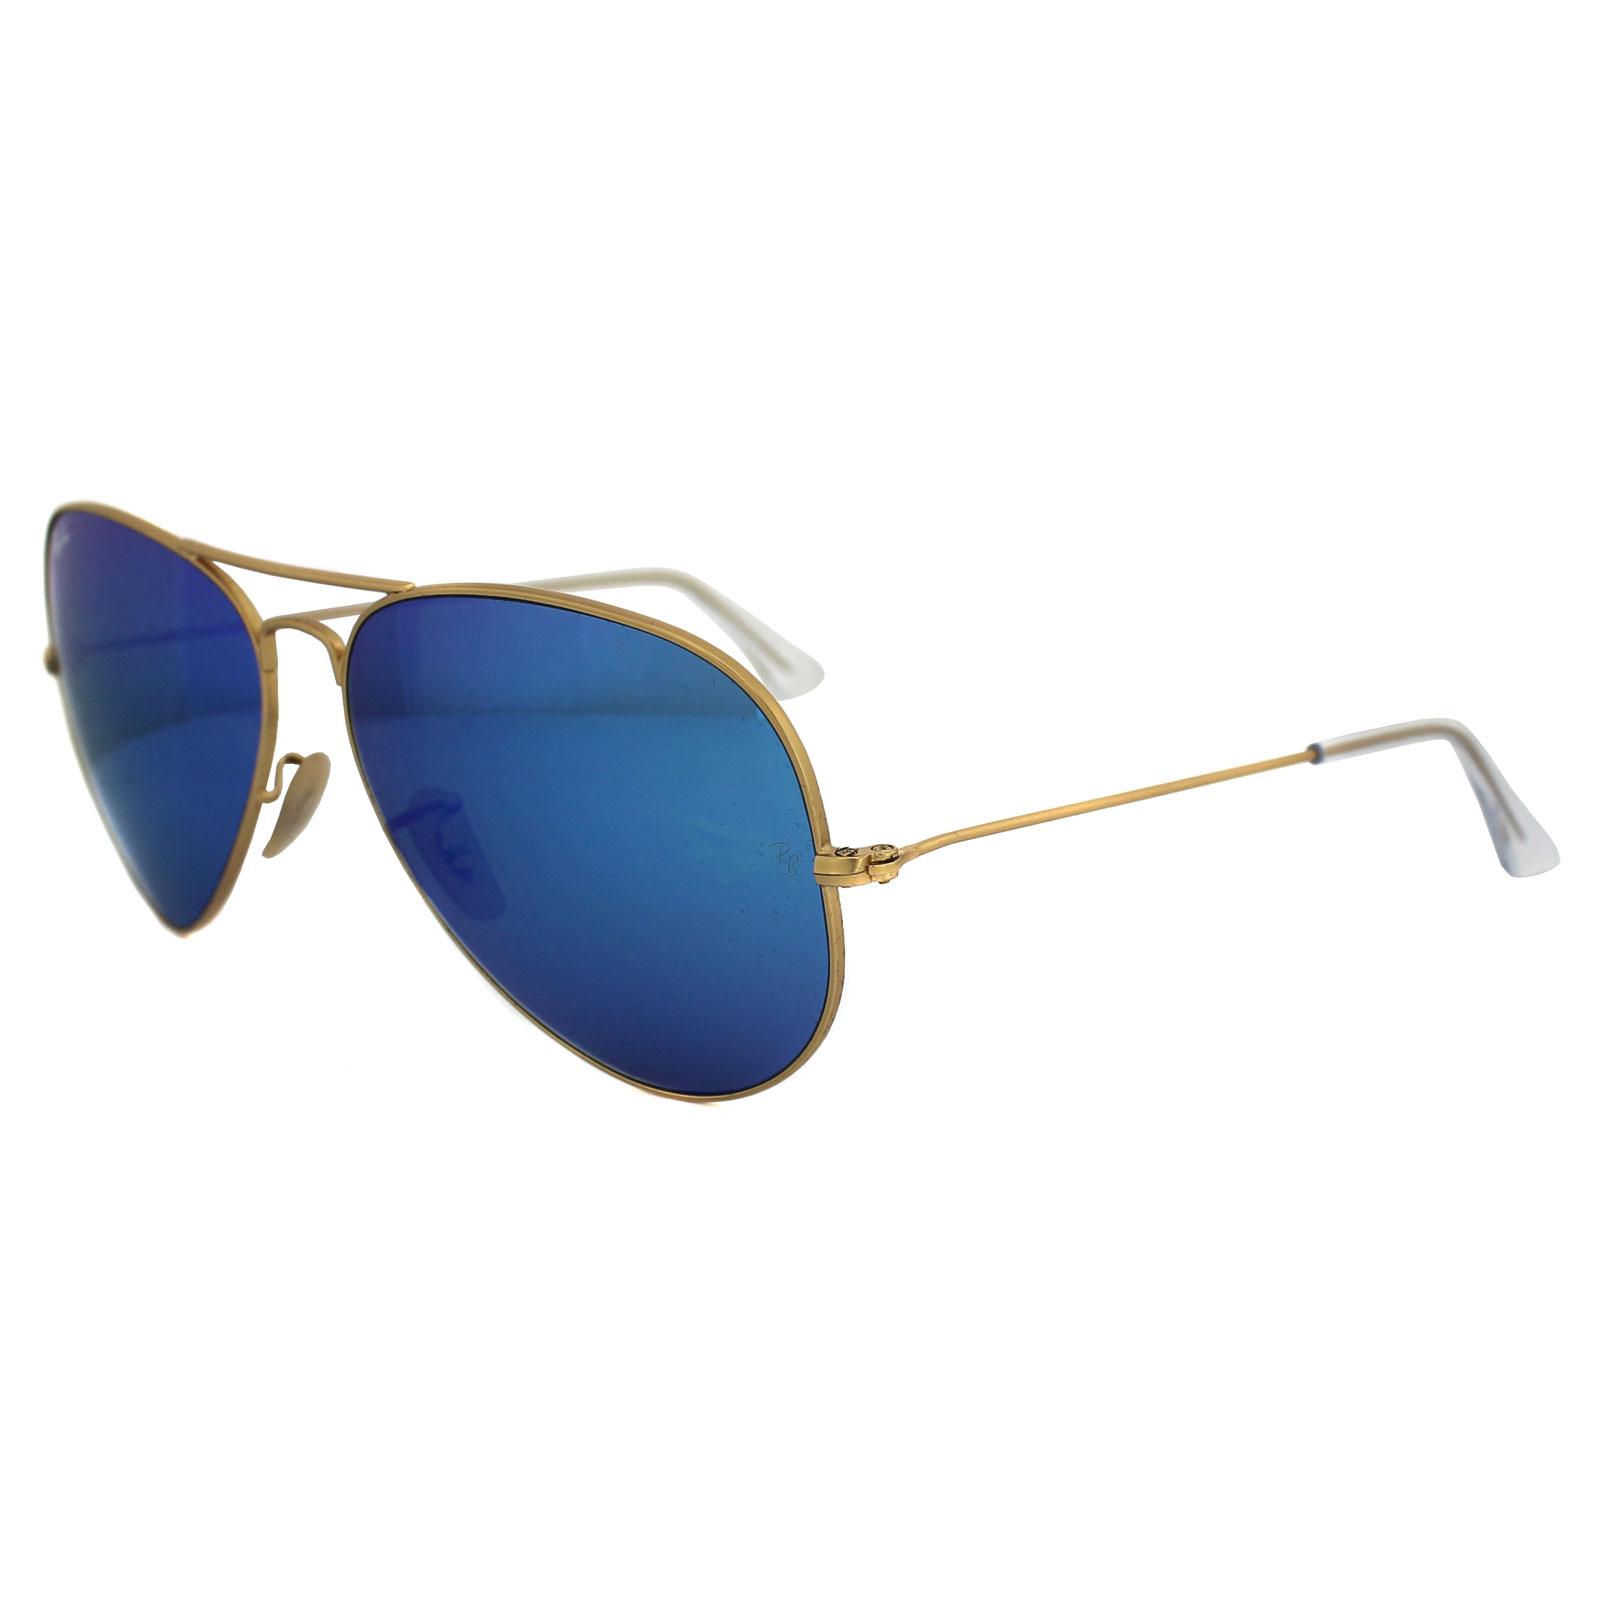 ray ban sunglasses aviator 3025 112 17 matt gold blue. Black Bedroom Furniture Sets. Home Design Ideas